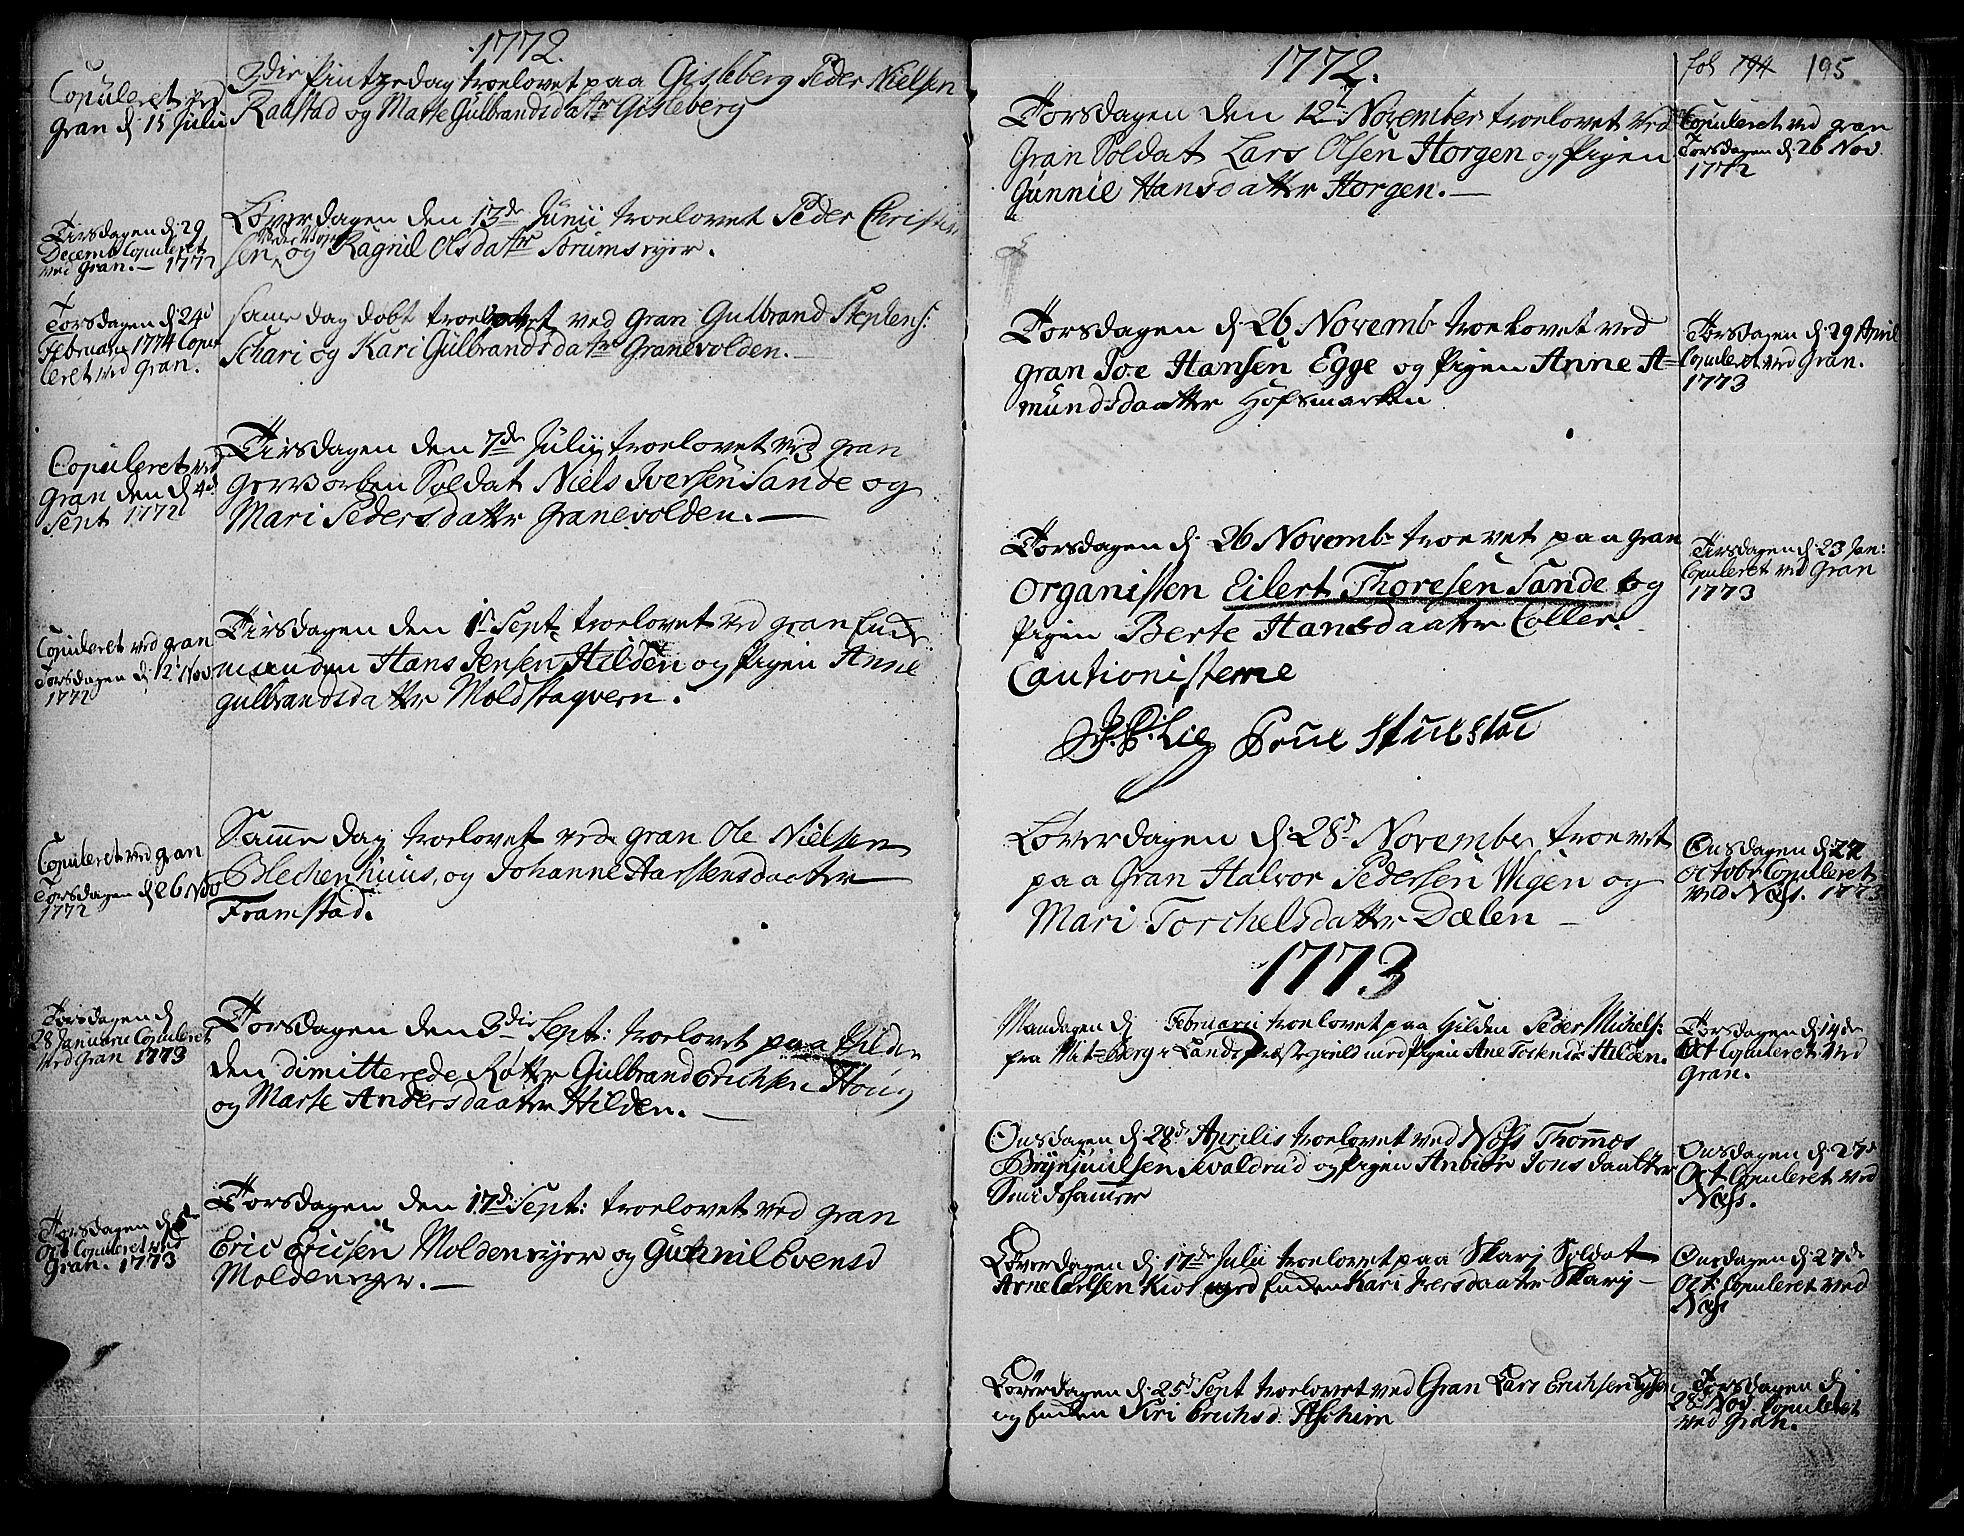 SAH, Gran prestekontor, Ministerialbok nr. 4, 1759-1775, s. 195